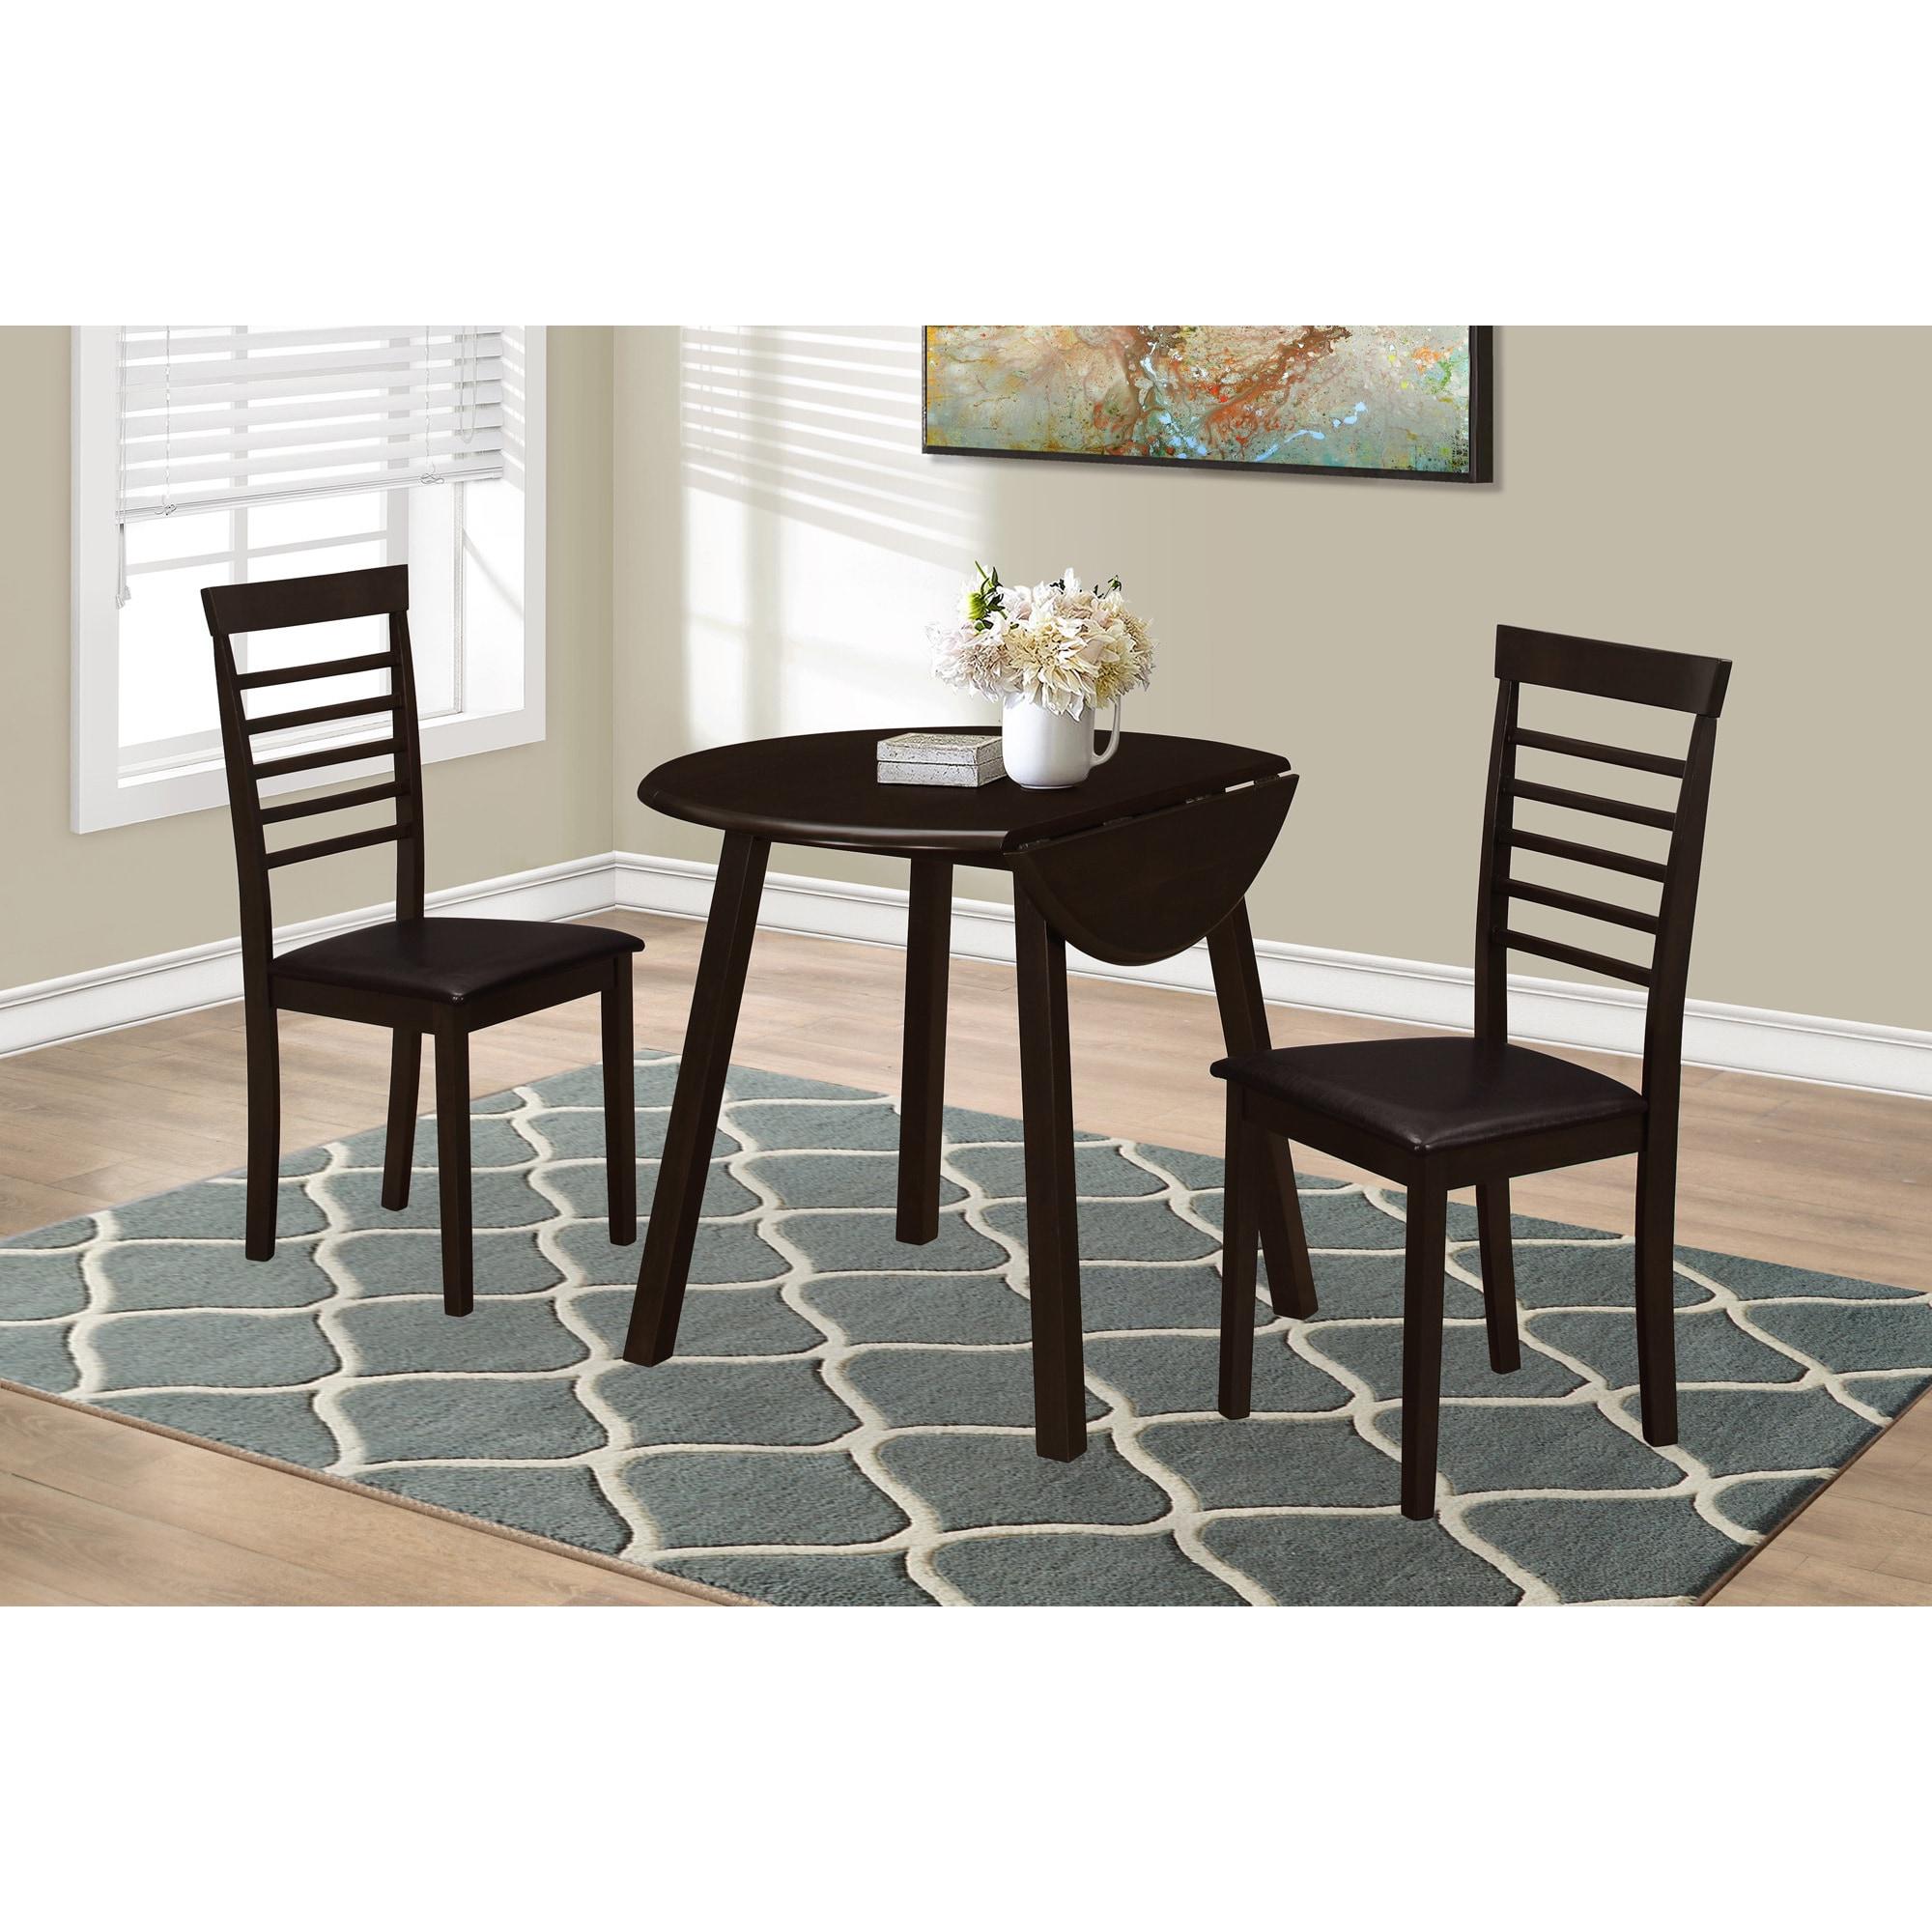 Monarch Cappuccino Drop Leaf 3-Piece Dining Room Set (Din...